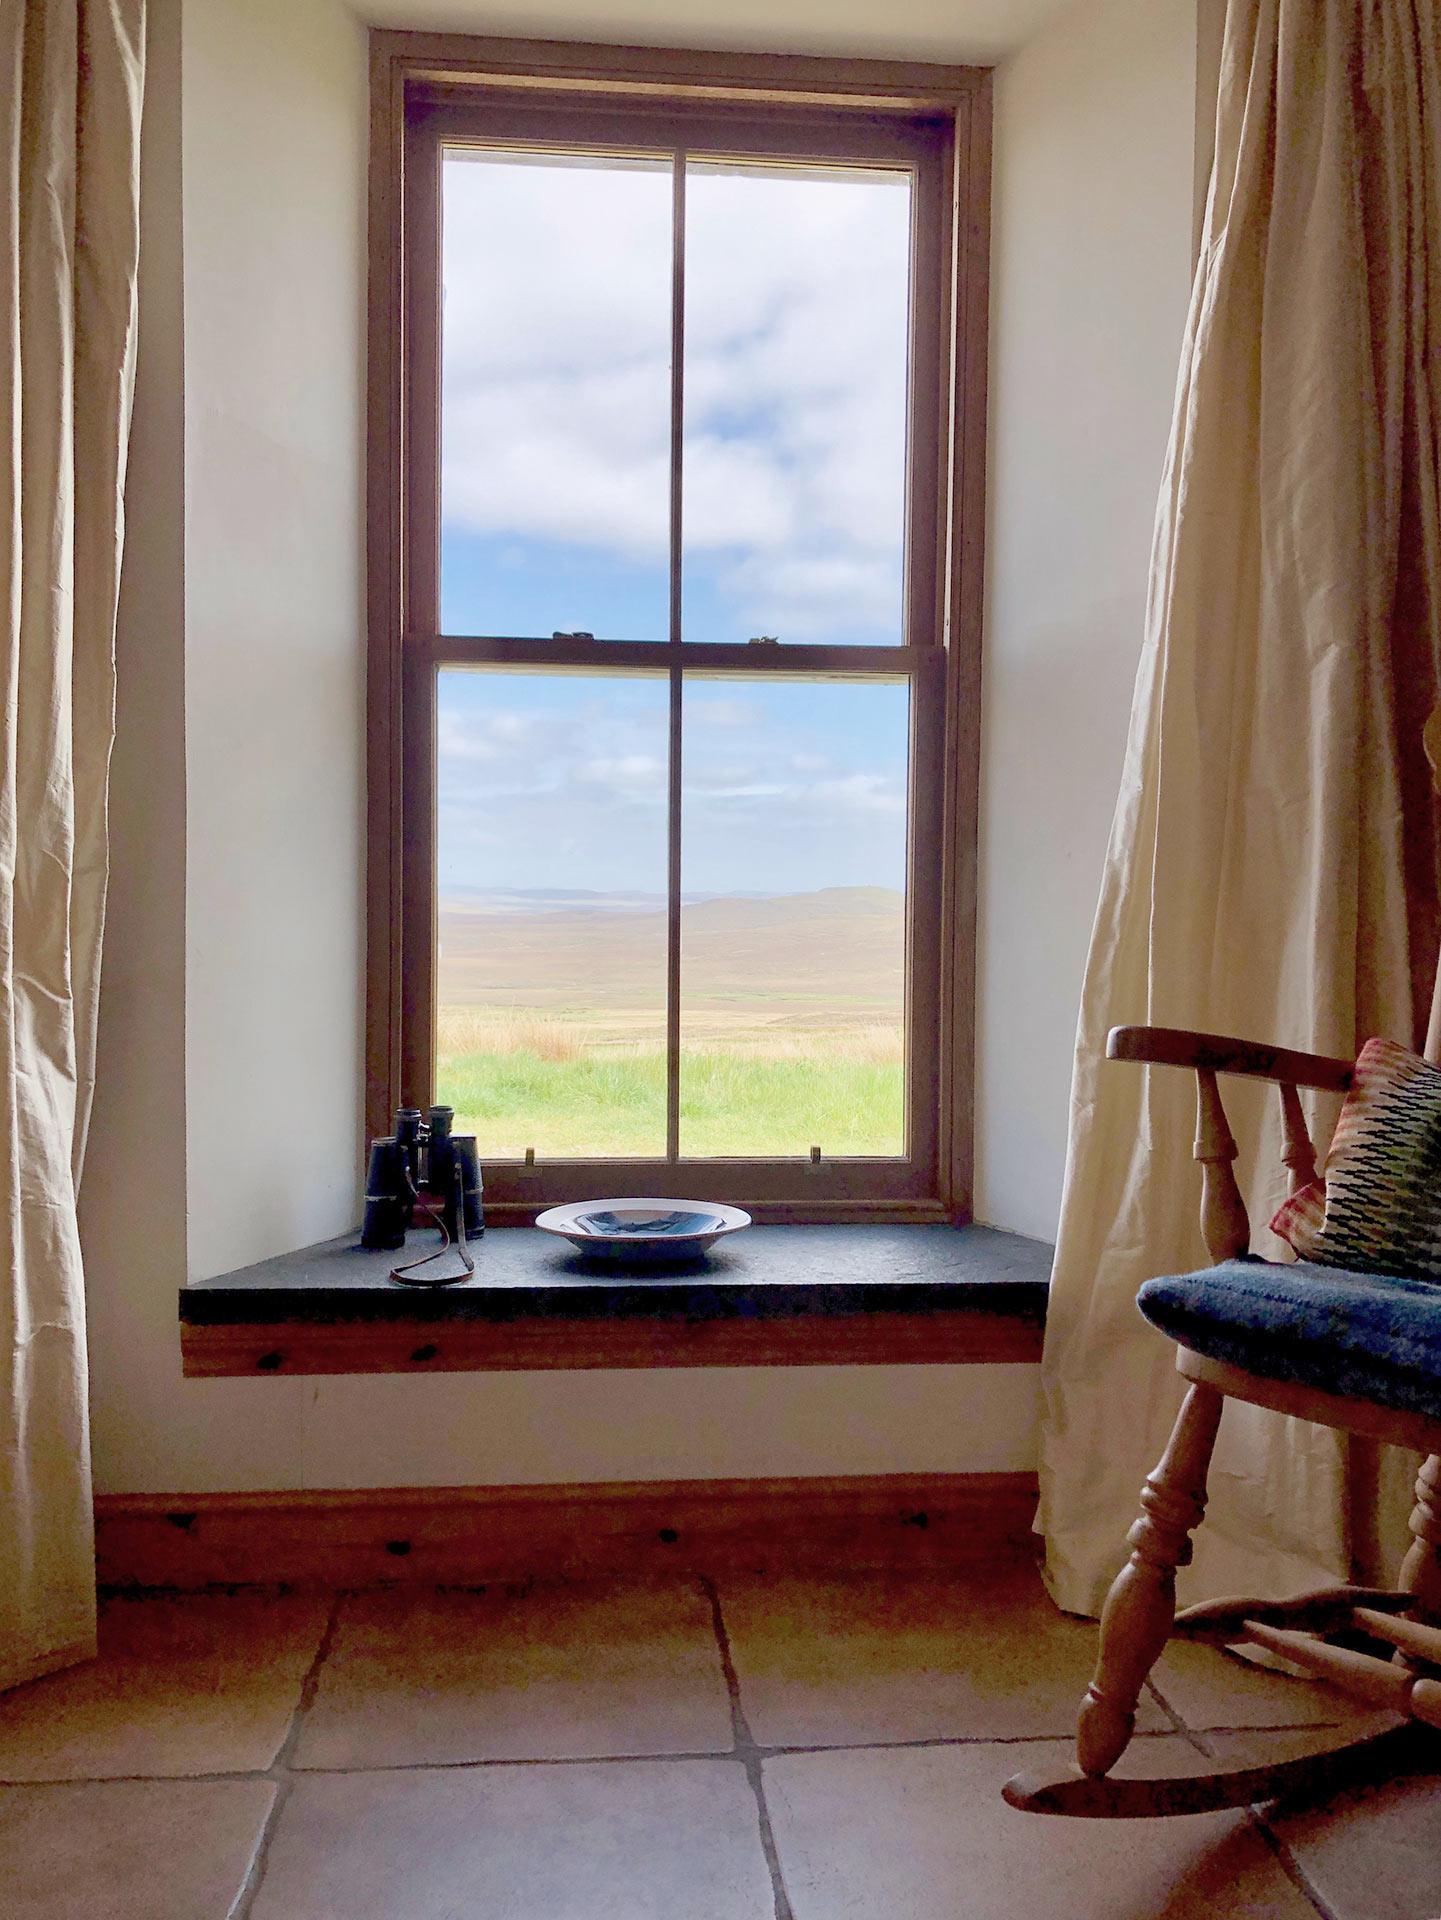 Skye window view